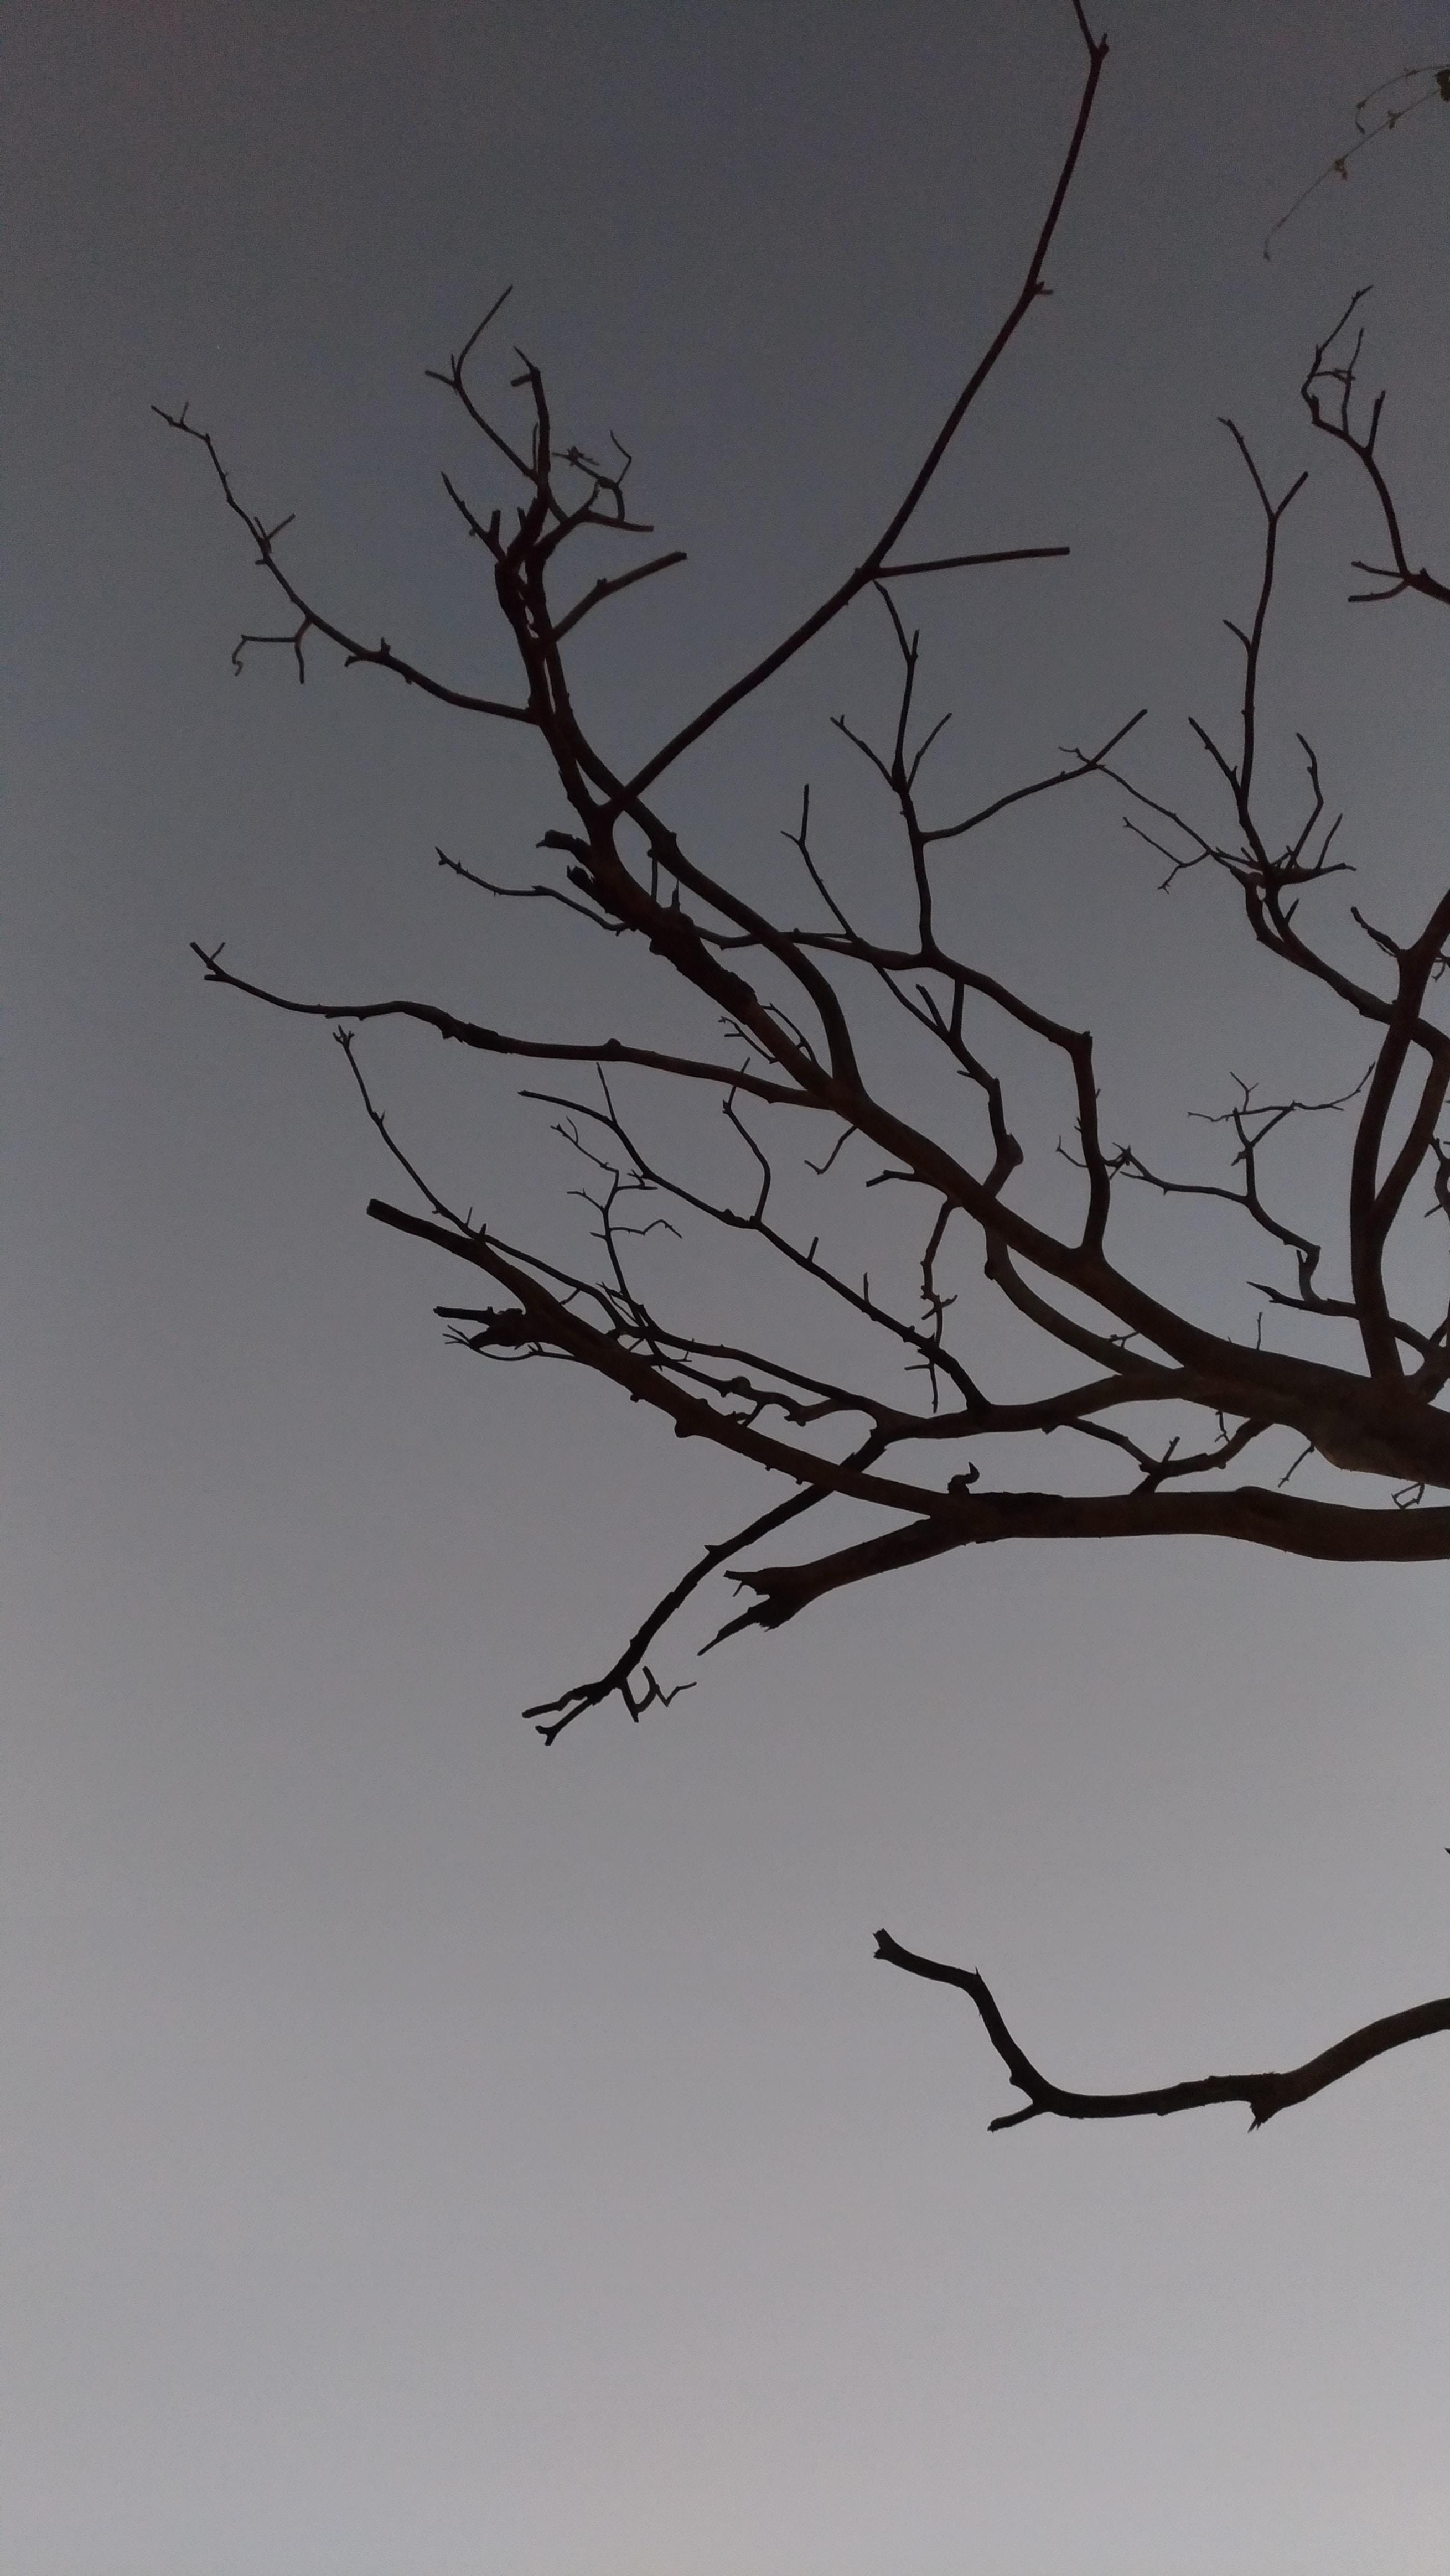 tree branch under gray sky